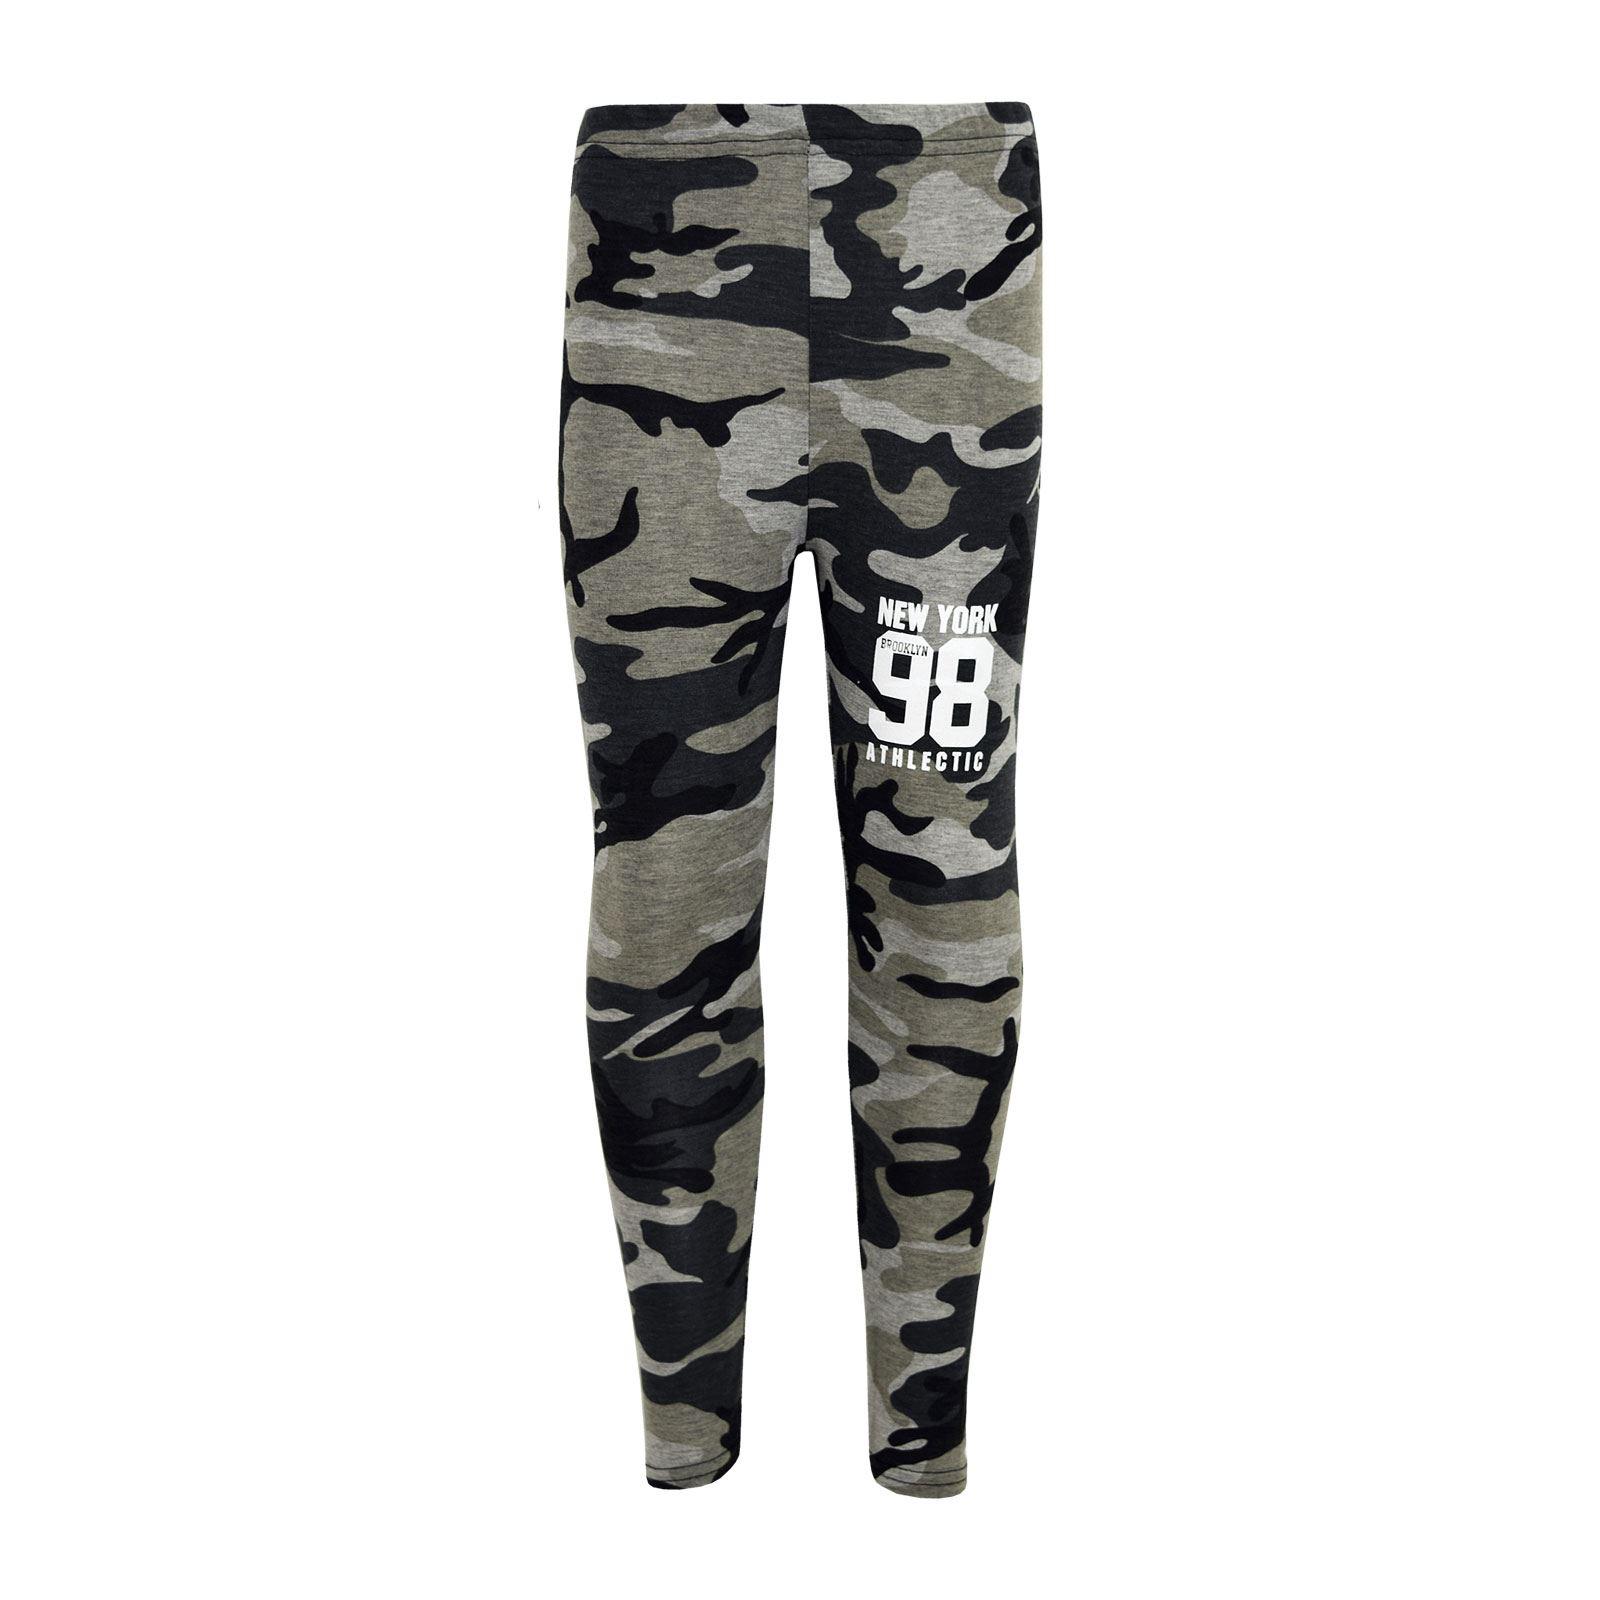 Girls-NEW-YORK-BROOKLYN-98-ATHLECTIC-Camouflage-Print-Top-amp-Legging-Set-7-13-Yr thumbnail 18